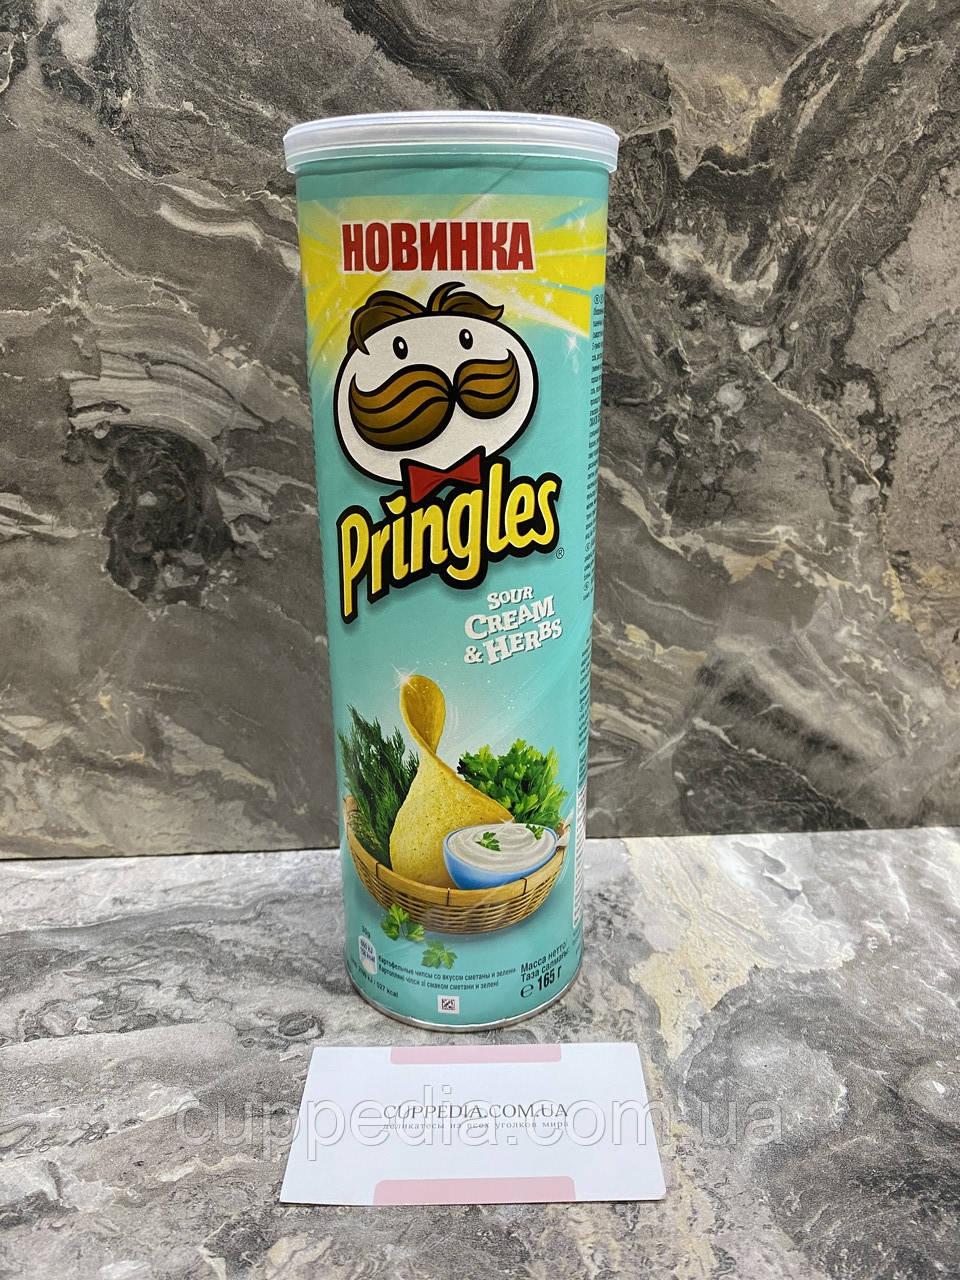 Чіпси Pringles sour creame & hersbs з сметаною і зельною 165 грм